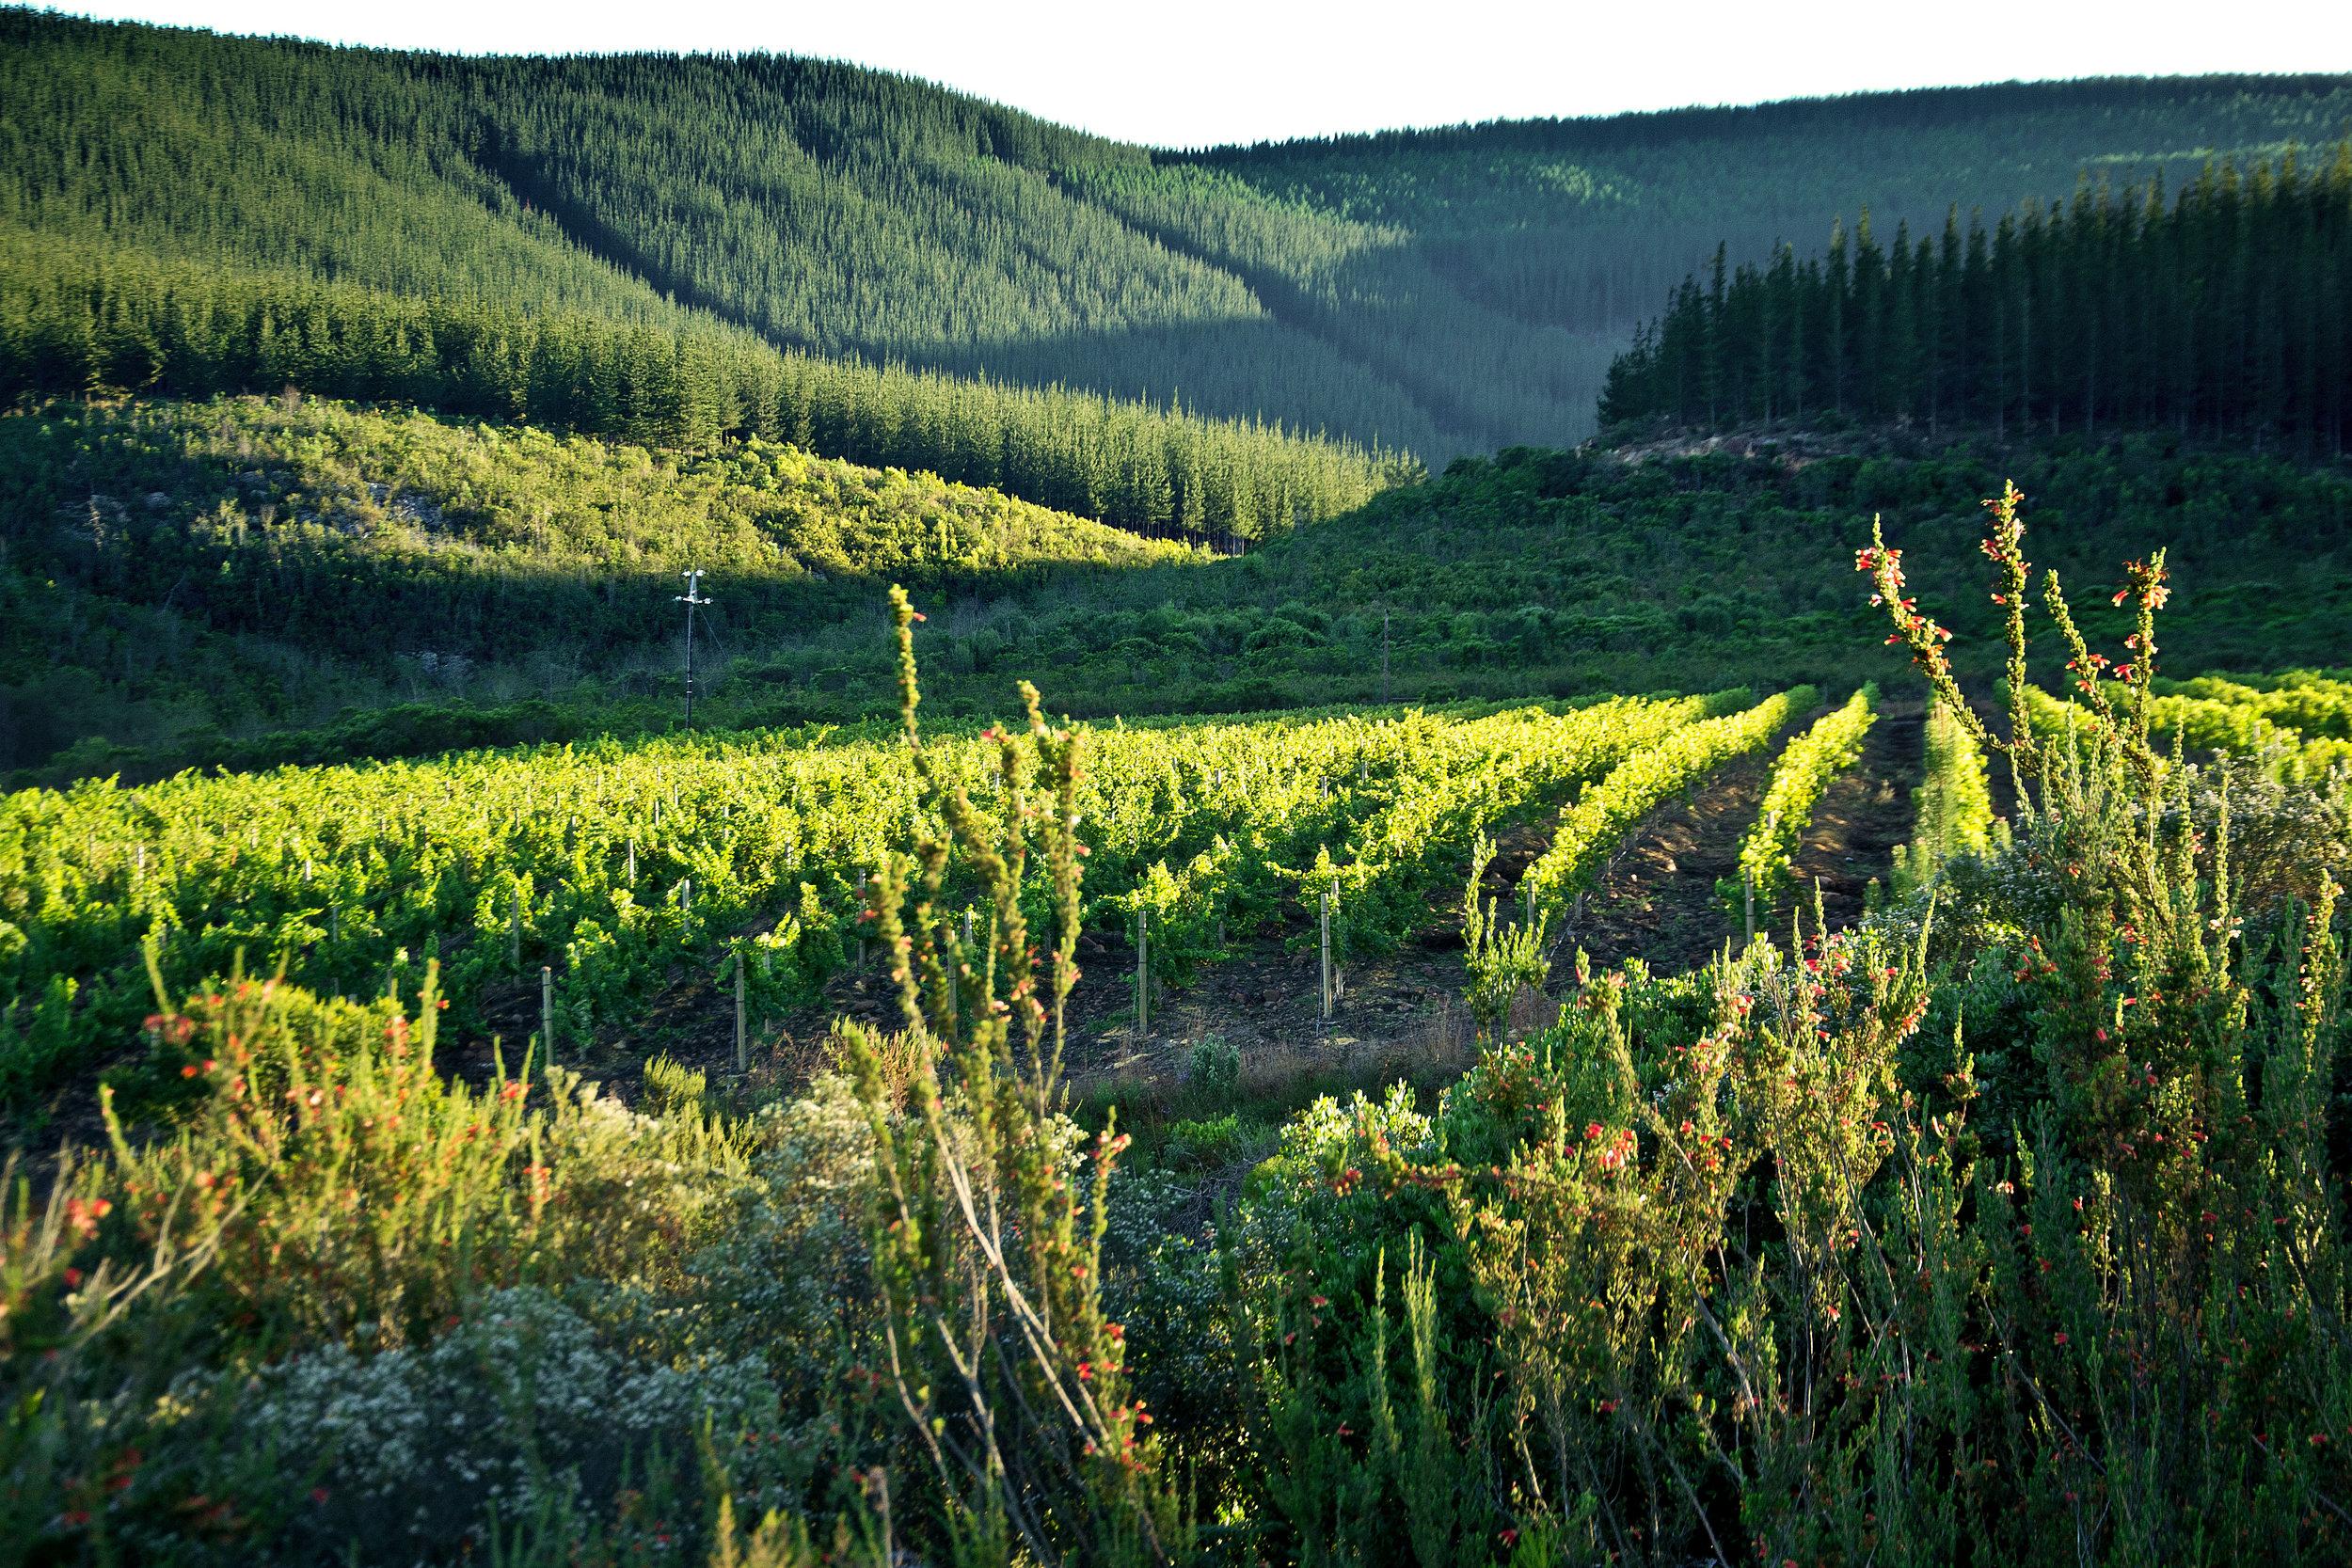 Forest & Vines.jpg